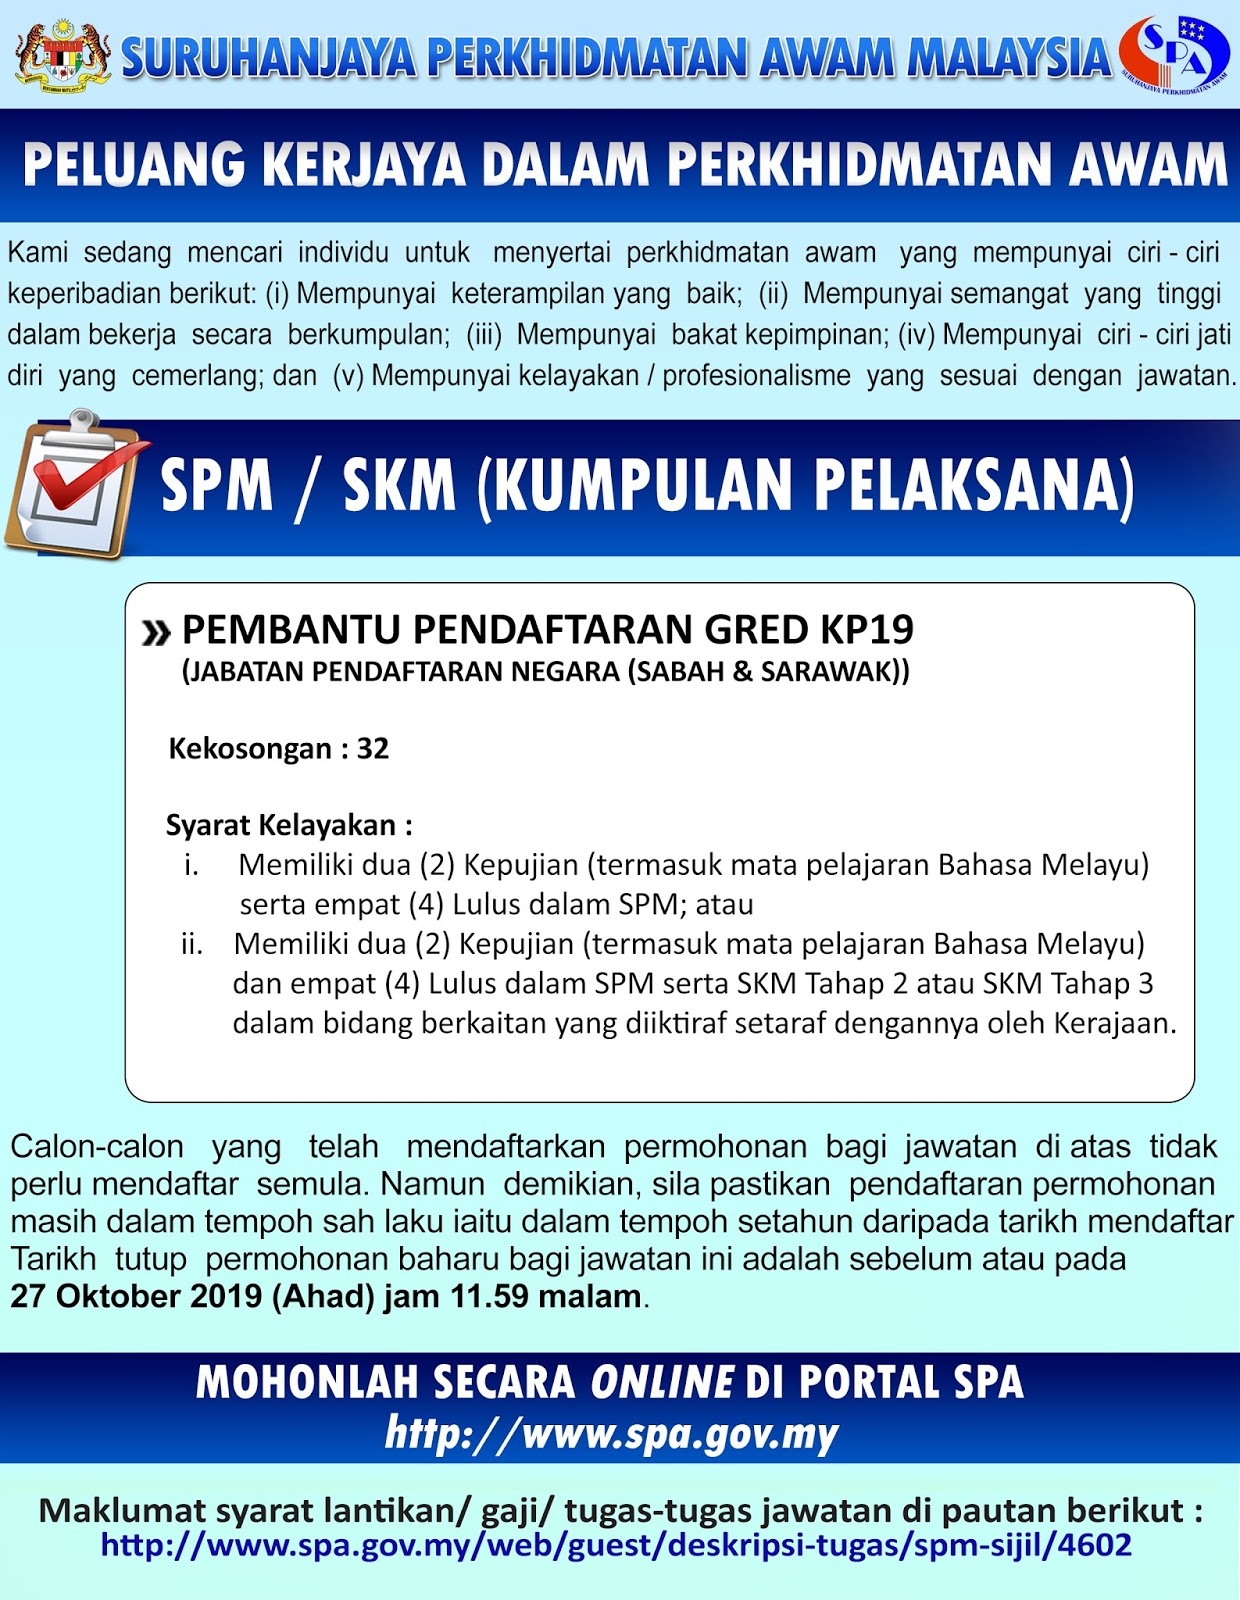 Jawatan Kosong Kerajaan 2019 Pembantu Pendaftaran Gred Kp19 Jpn Sabah Sarawak Jawatan Kosong Terkini Negeri Sabah